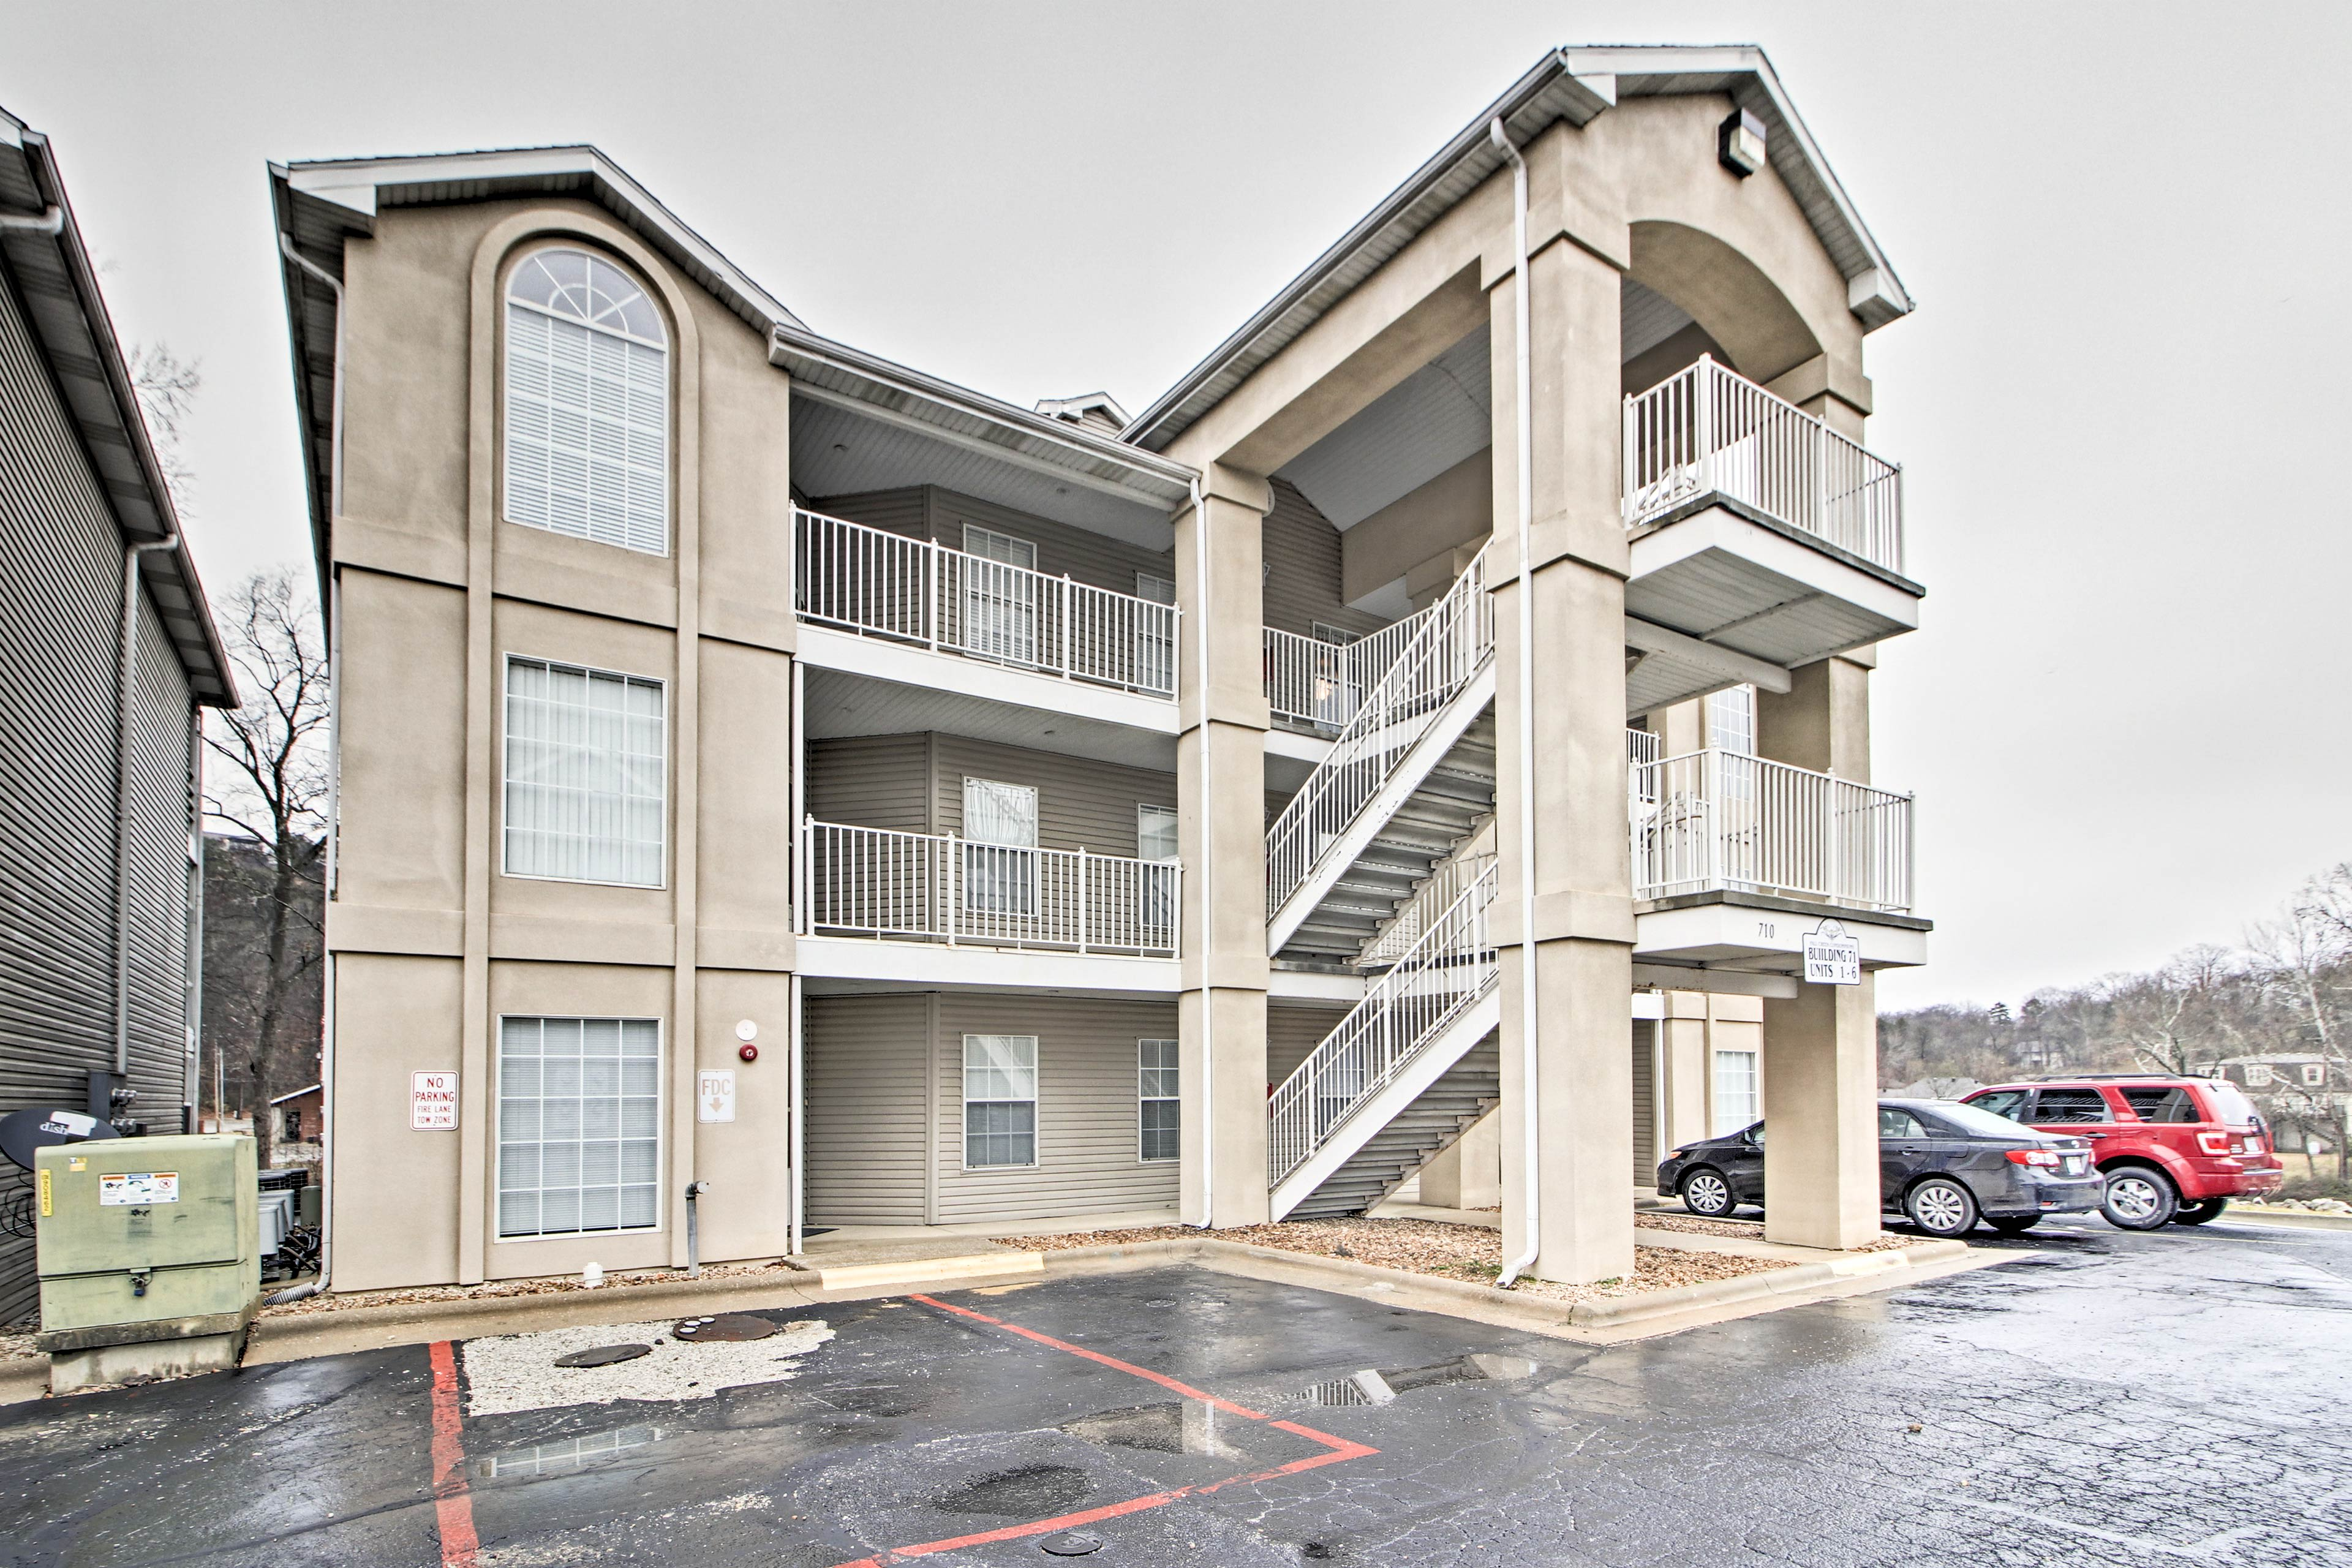 The vacation rental is a third-floor condo in Diamond Resort.